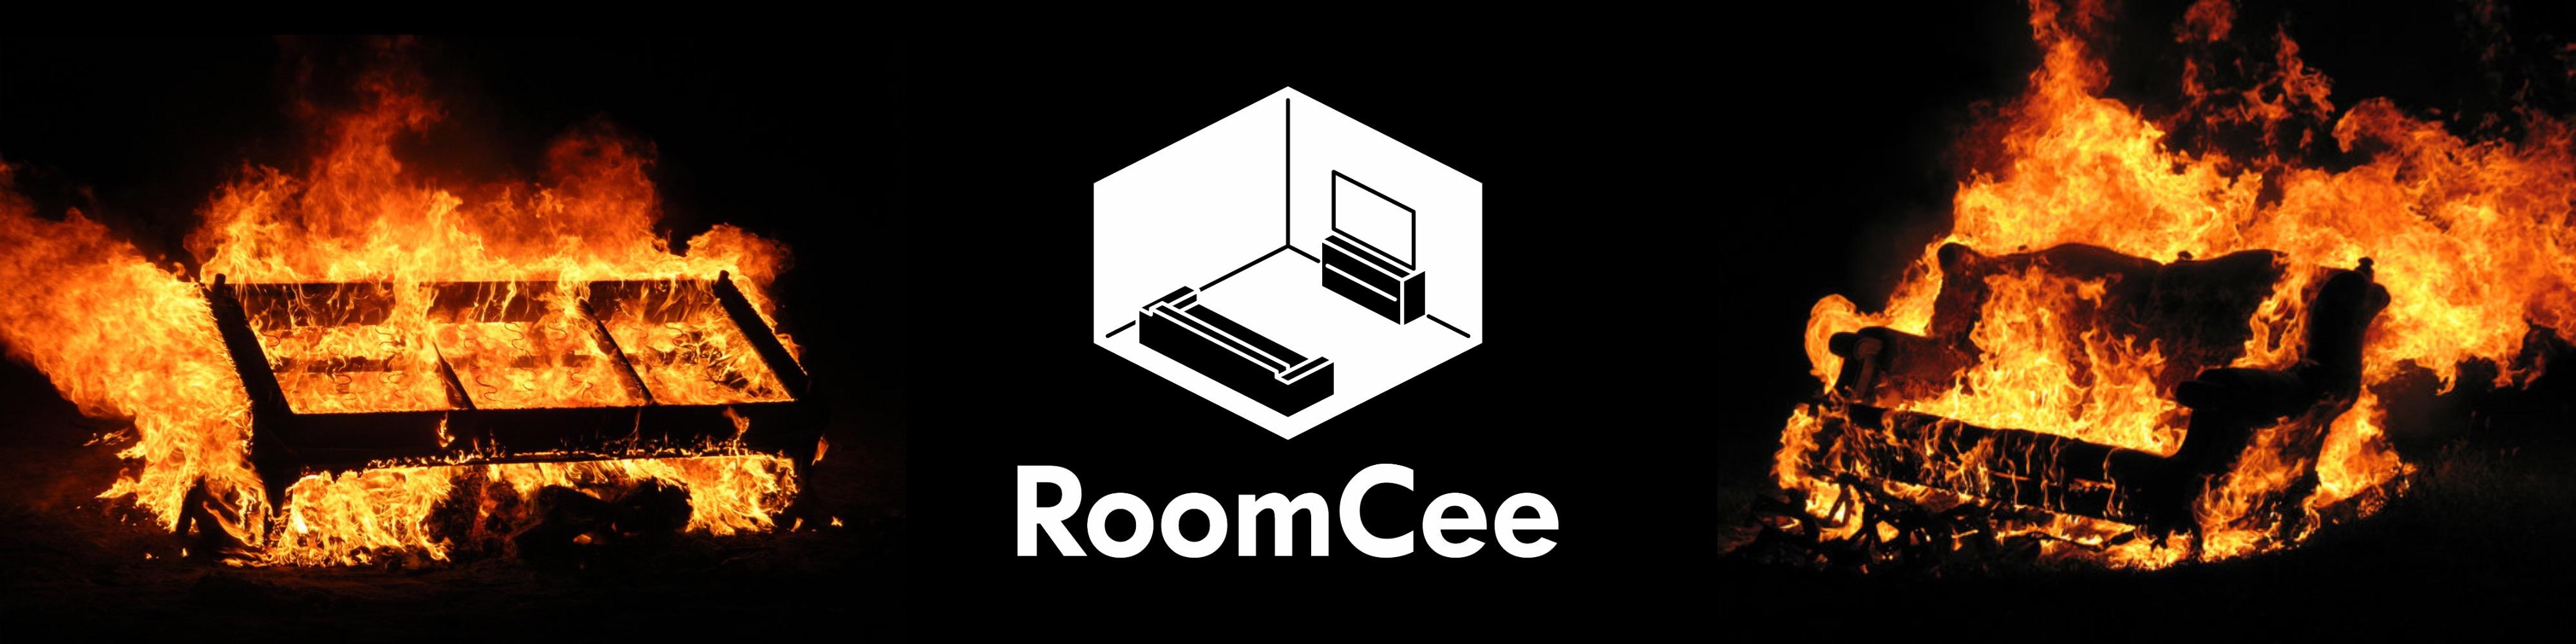 RoomCee